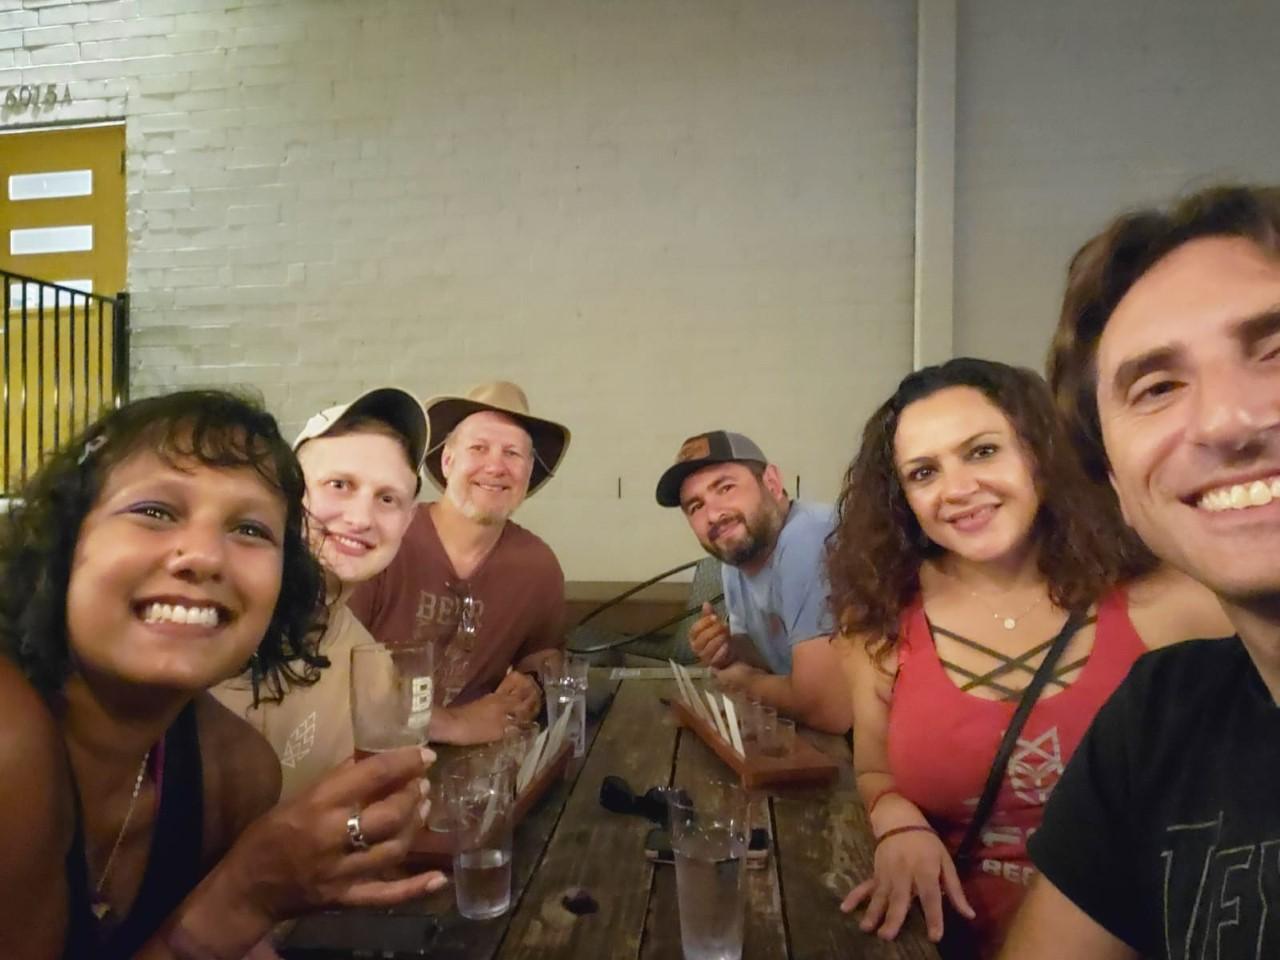 Brewery Travels (Joel Geier) and friends at the Brewtorium